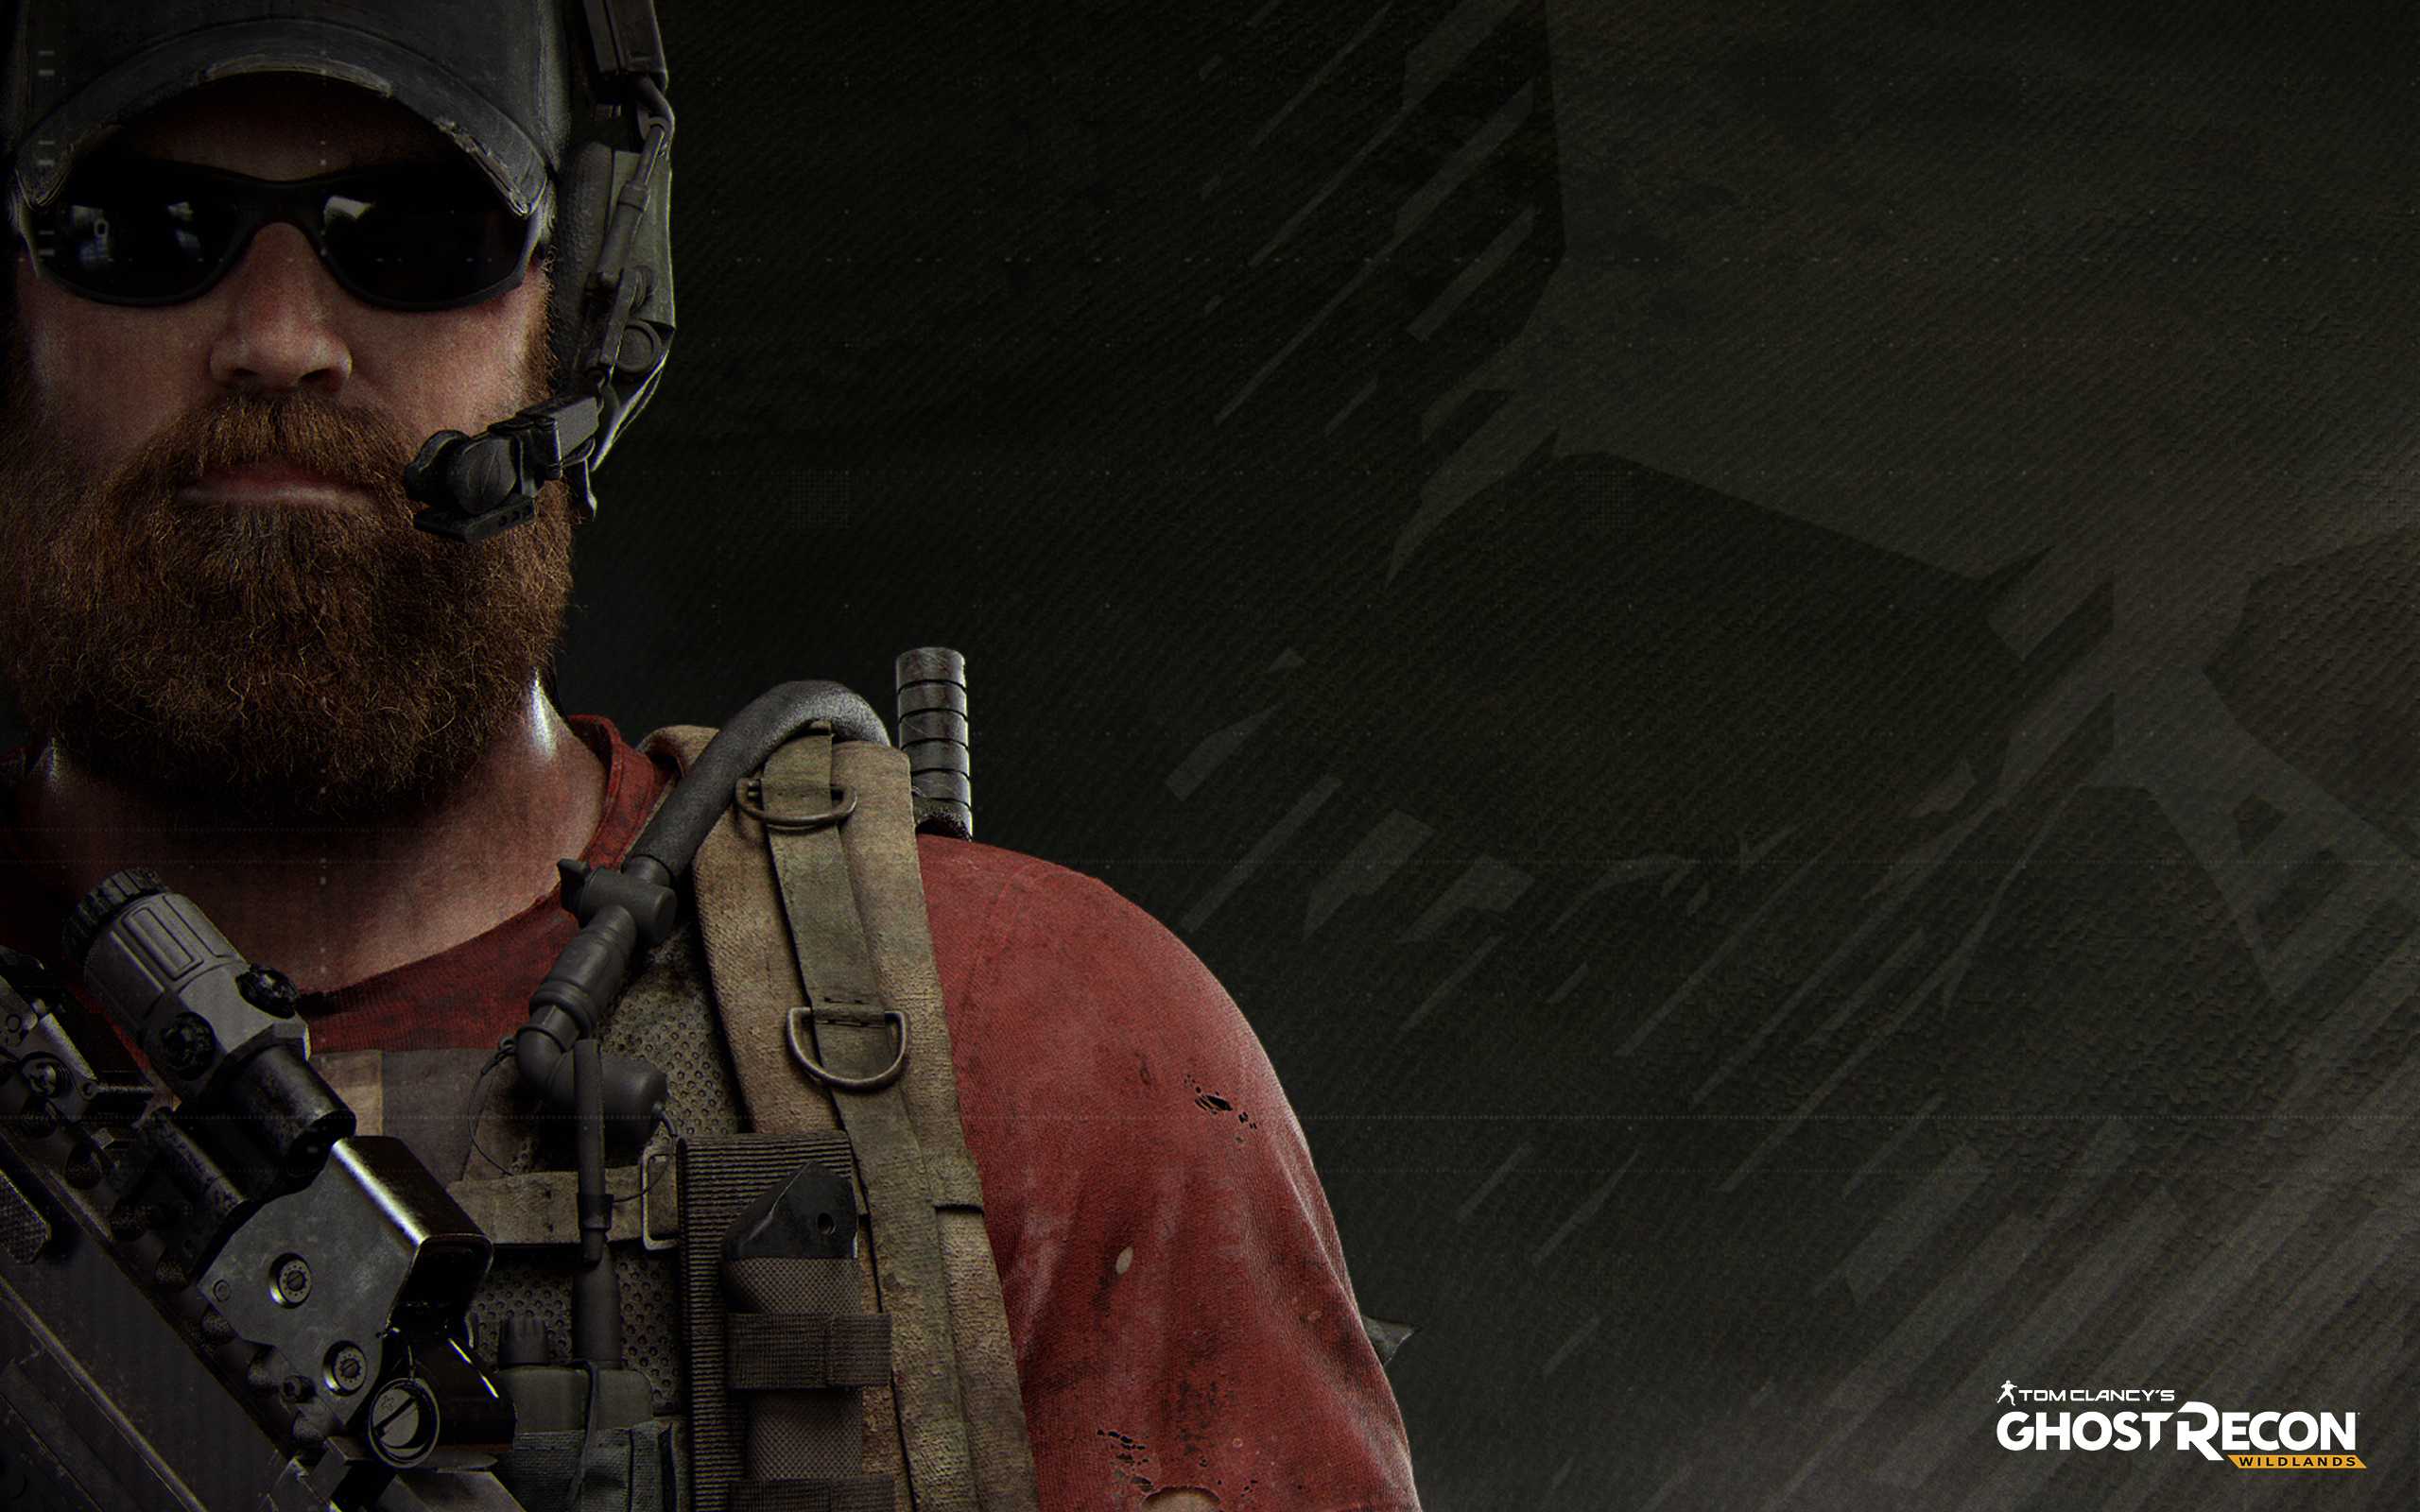 Nomad Tom Clancys Ghost Recon Wildlands, HD Games, 4k